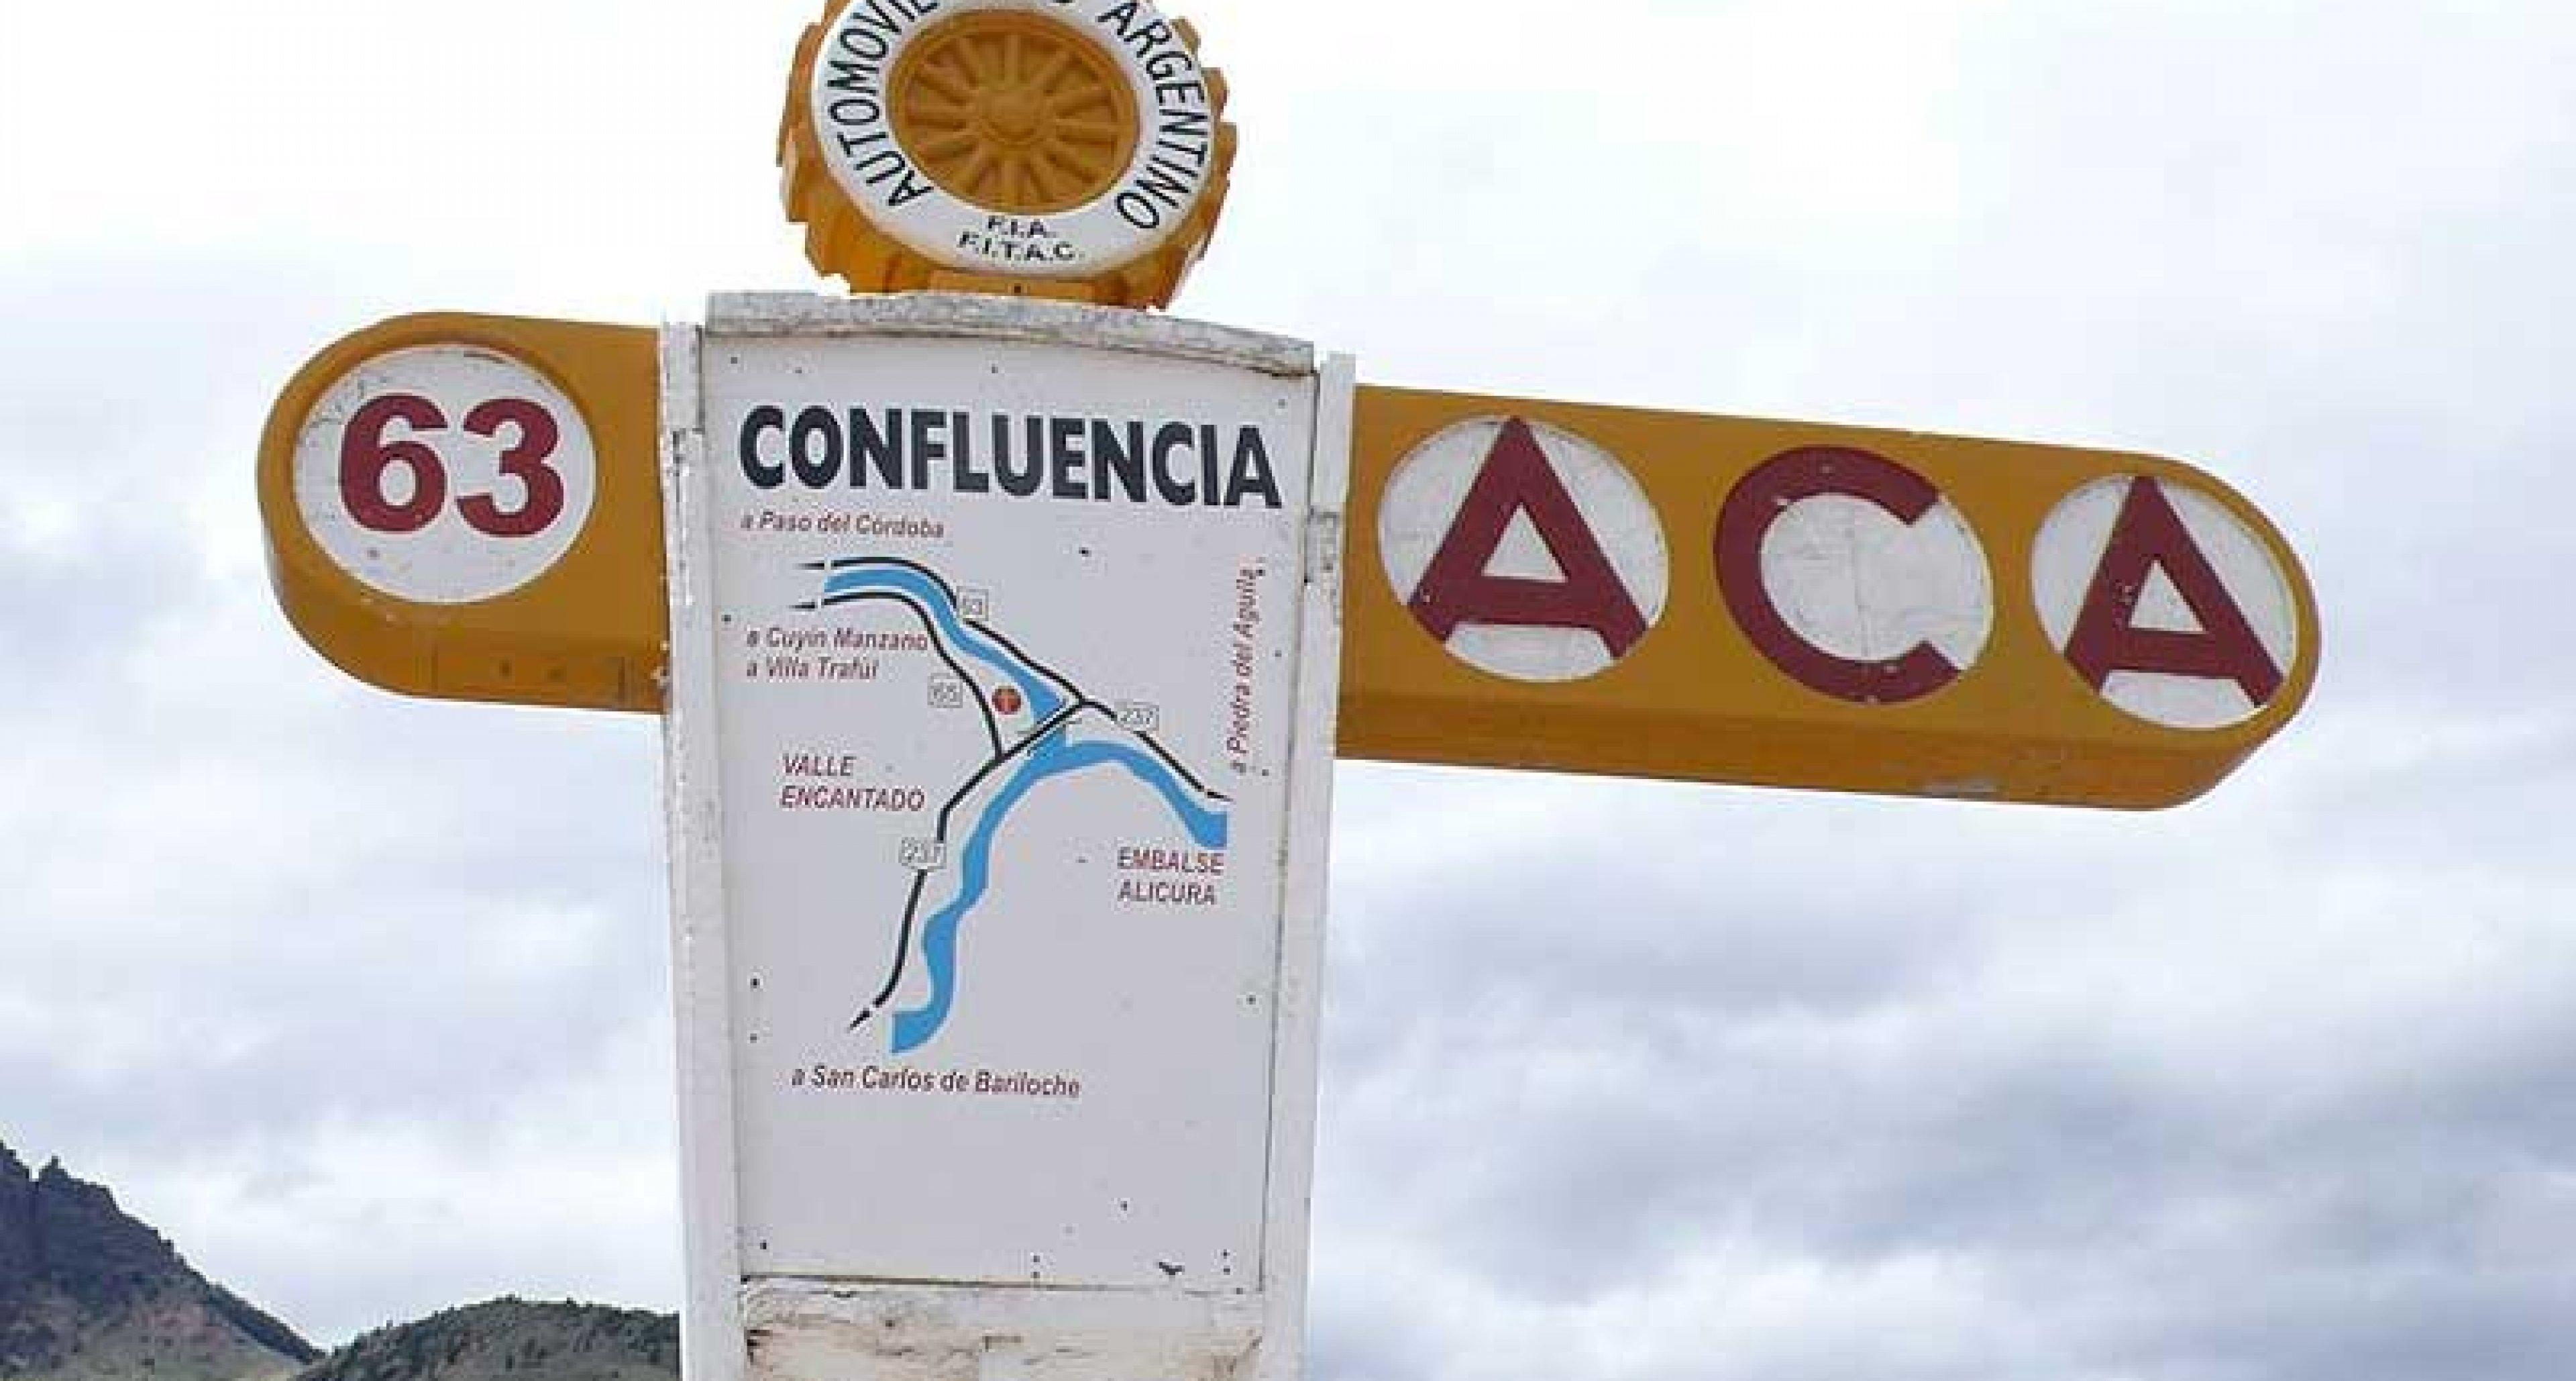 Argentinean Mille Miglia